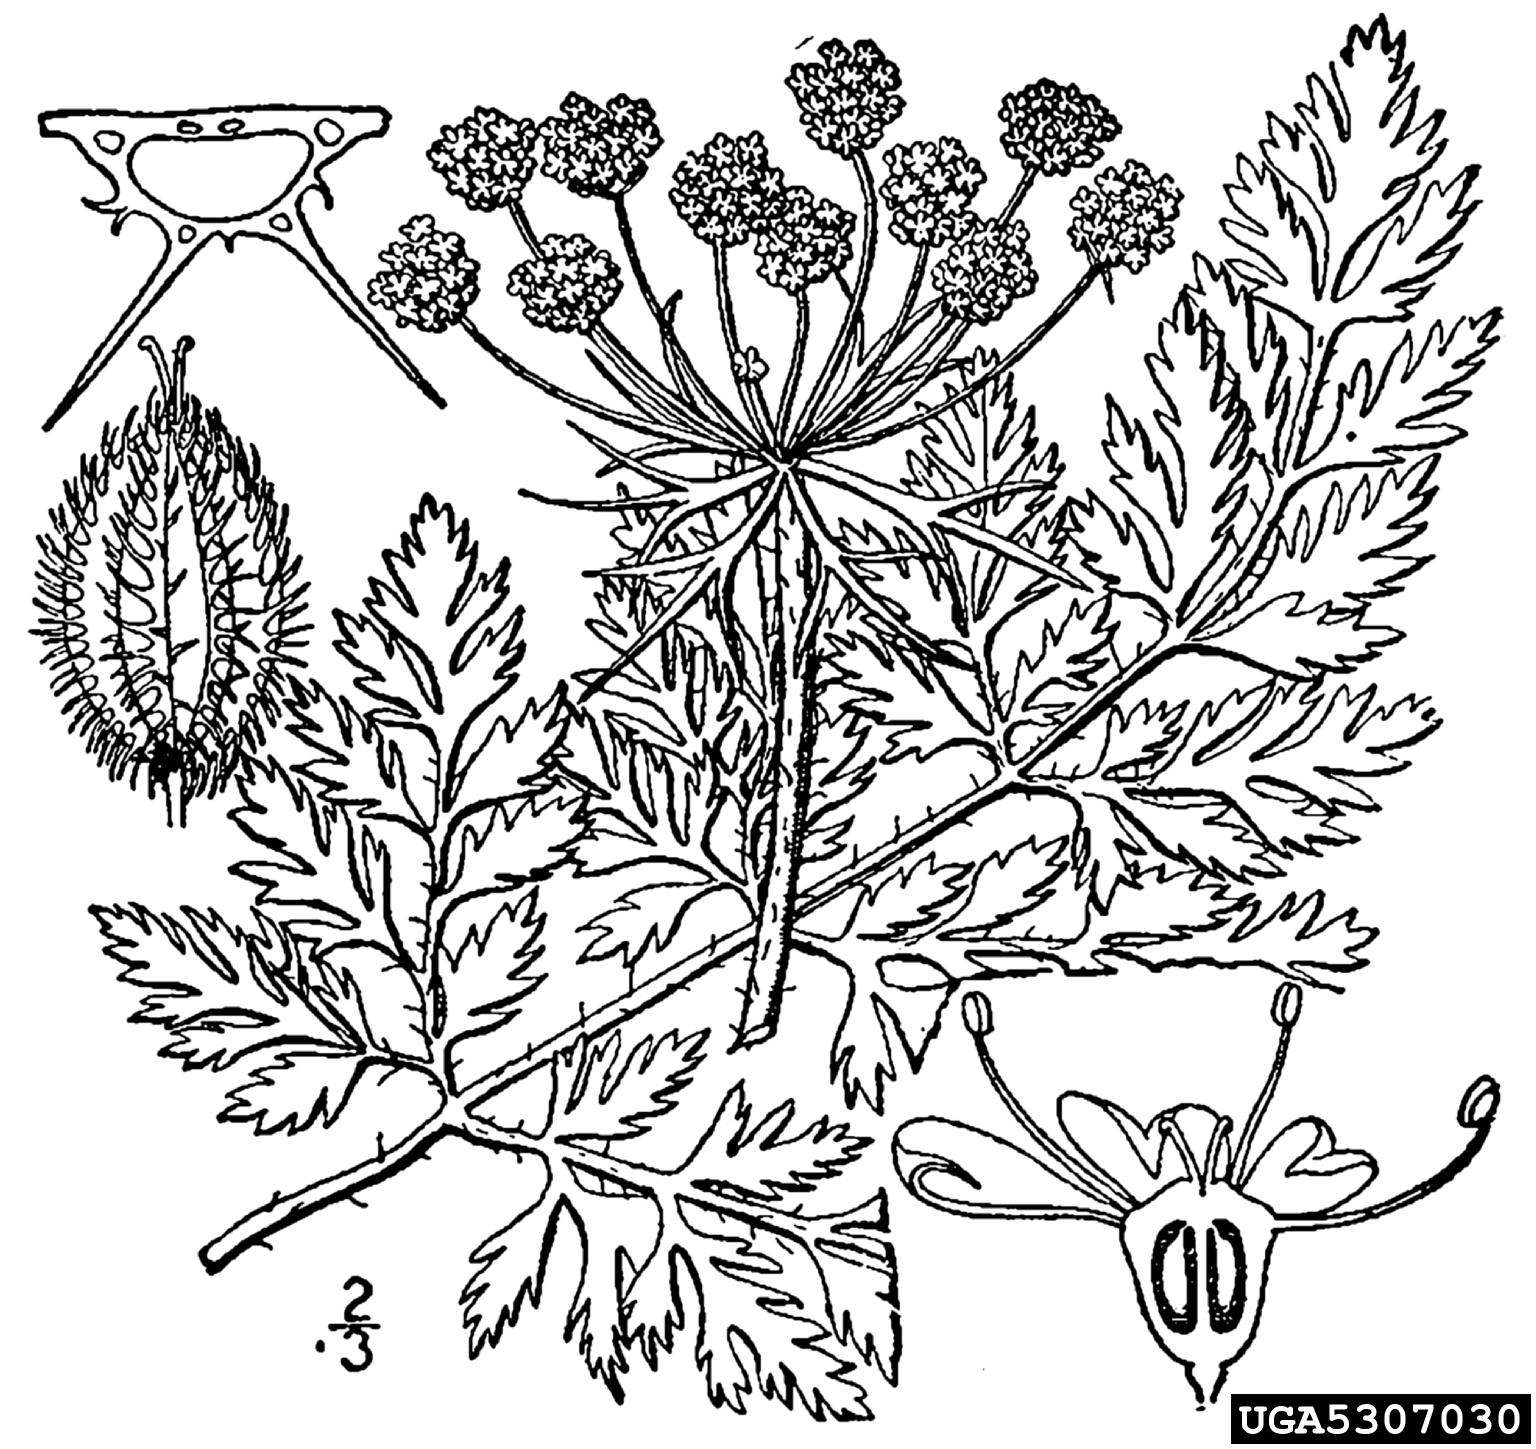 Queen Anne's lace, wild carrot, Daucus carota (Apiales